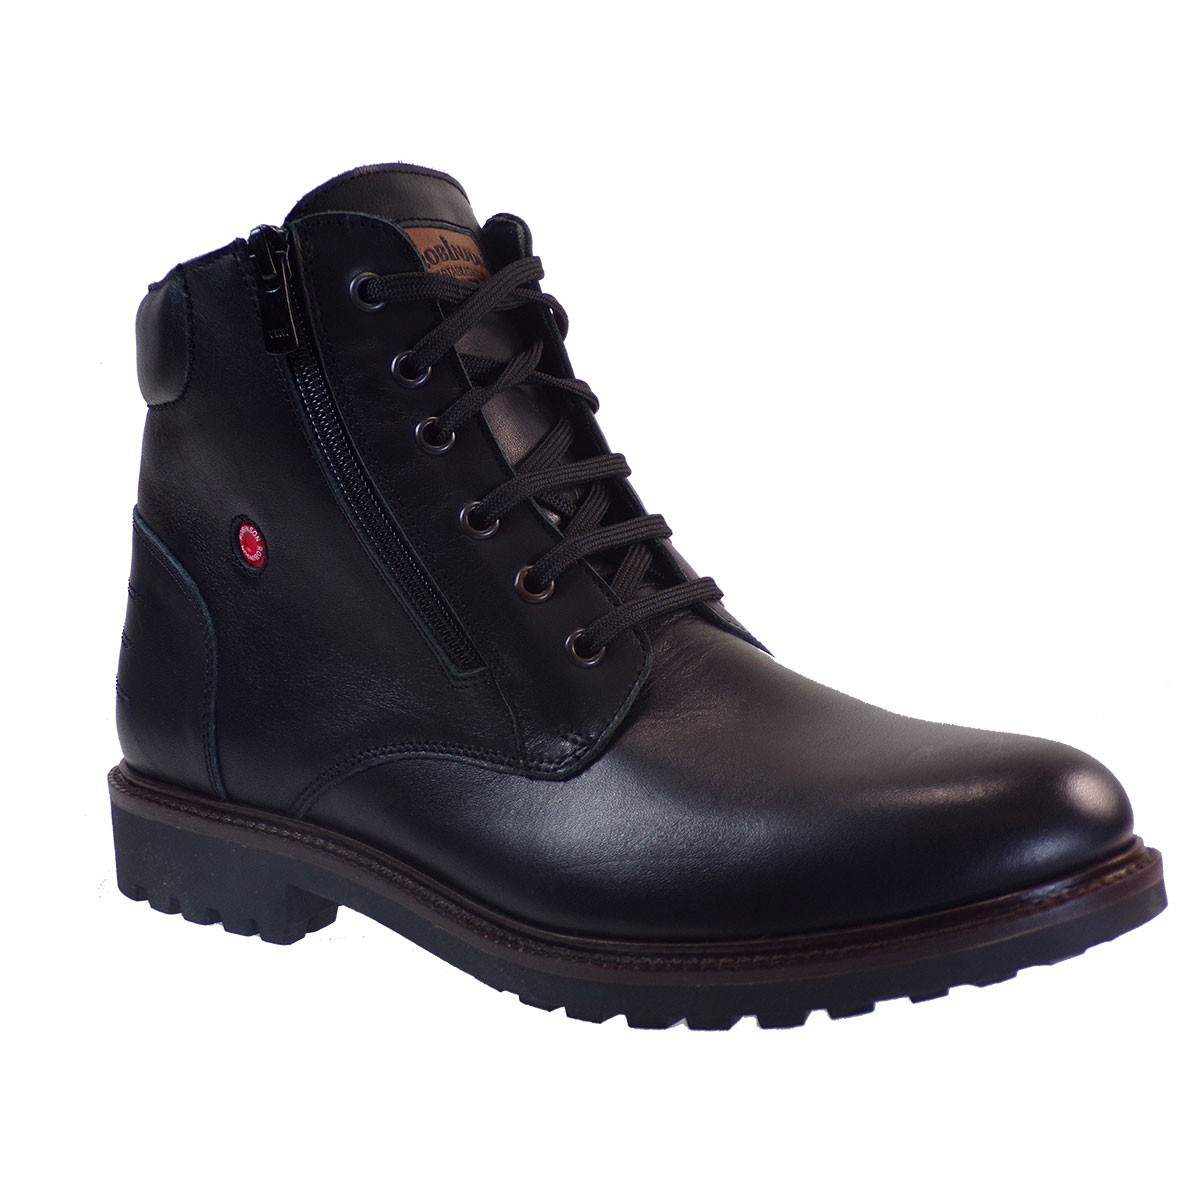 Robinson Ανδρικά Παπούτσια Μποτάκια Αρβυλάκια 1706 Μαύρο Δέρμα